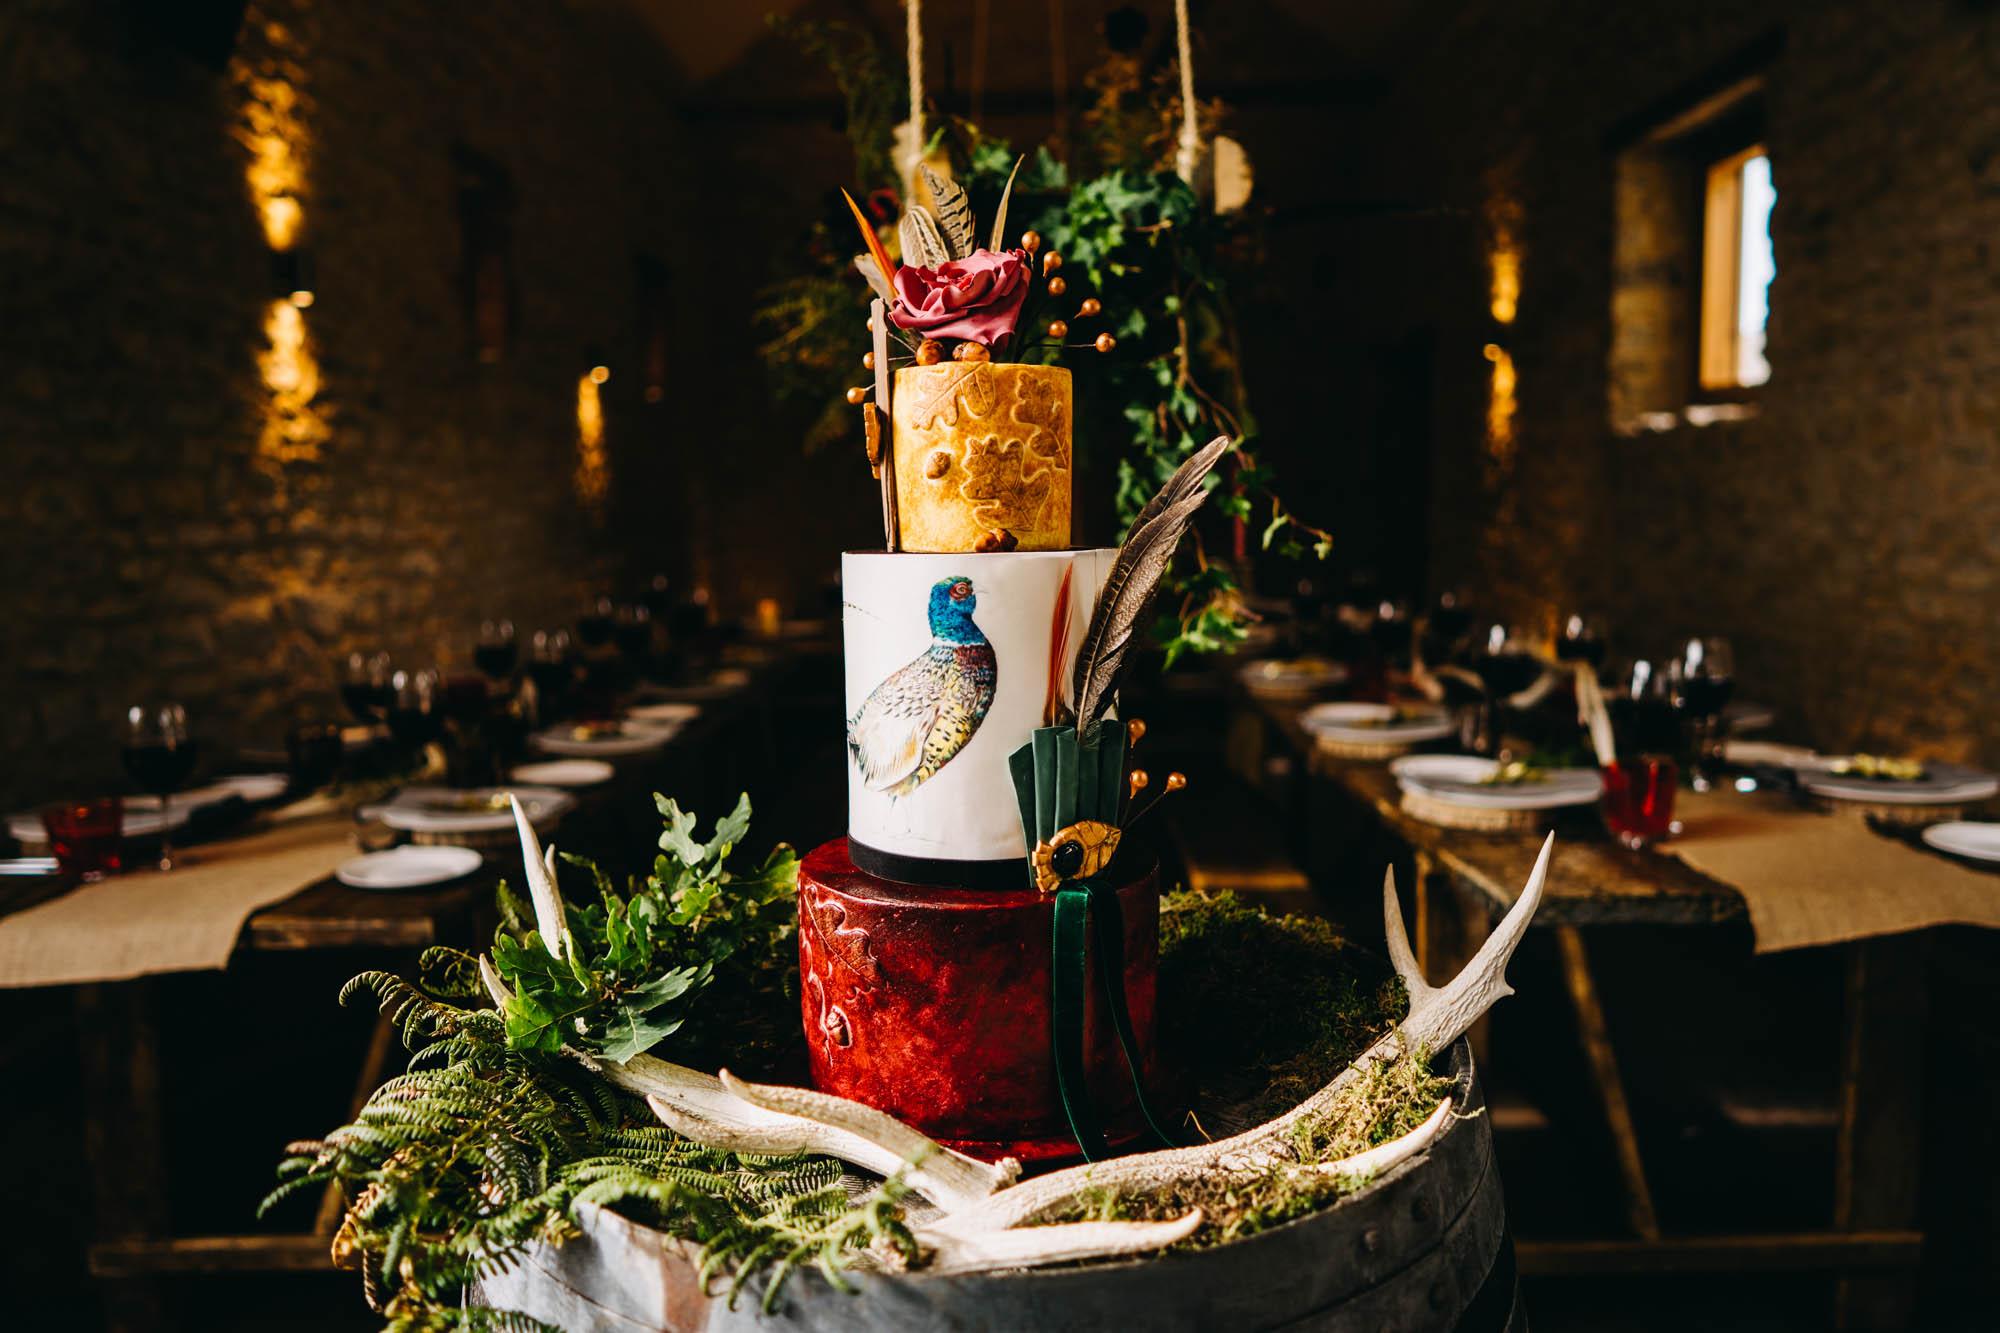 huntsmill-farm-wedding-inspiration-7